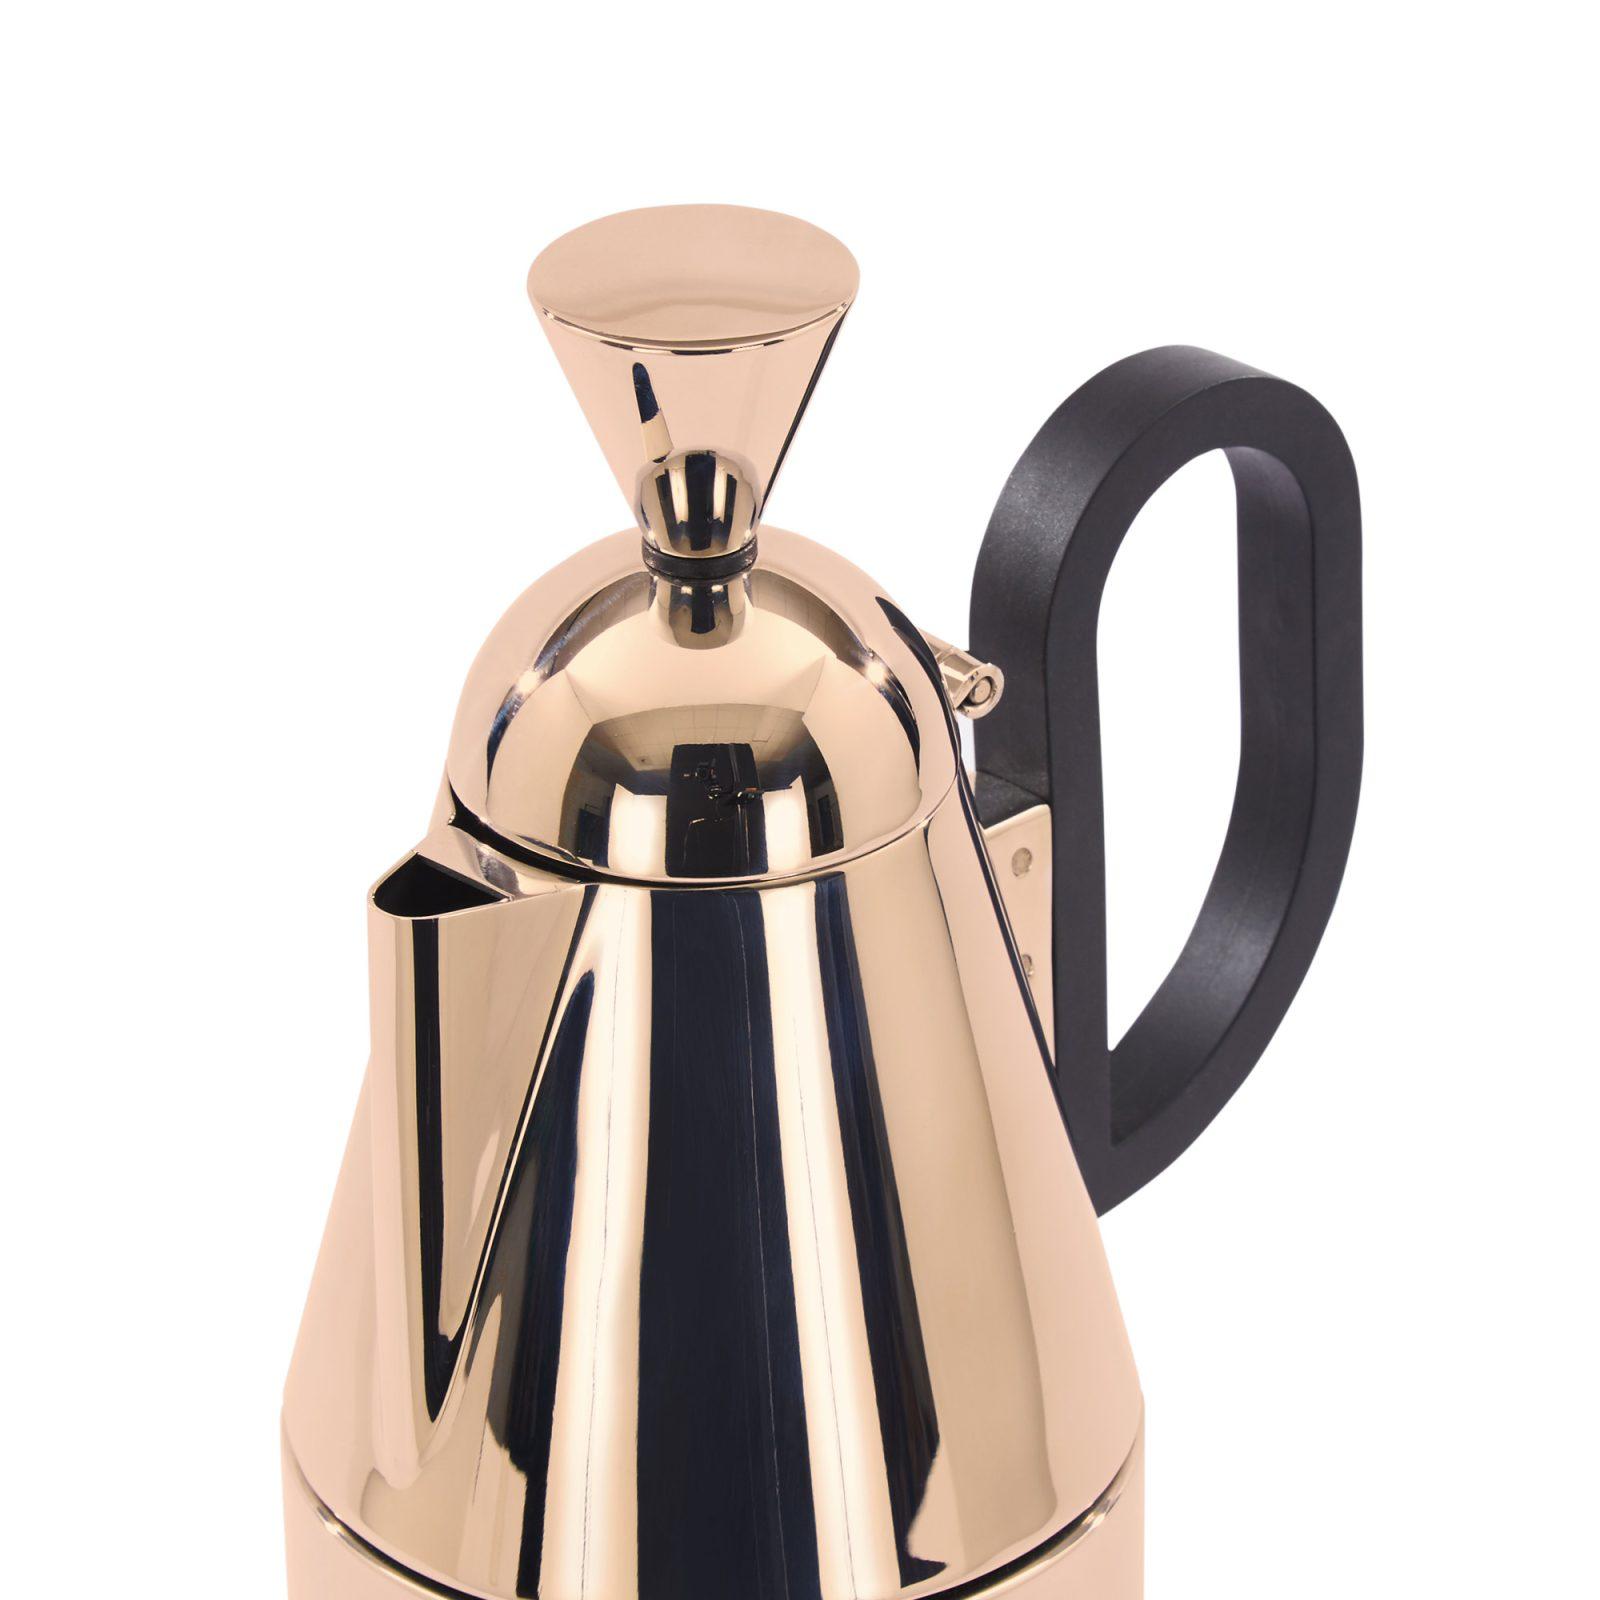 brew-stove-top-coffee-maker-4